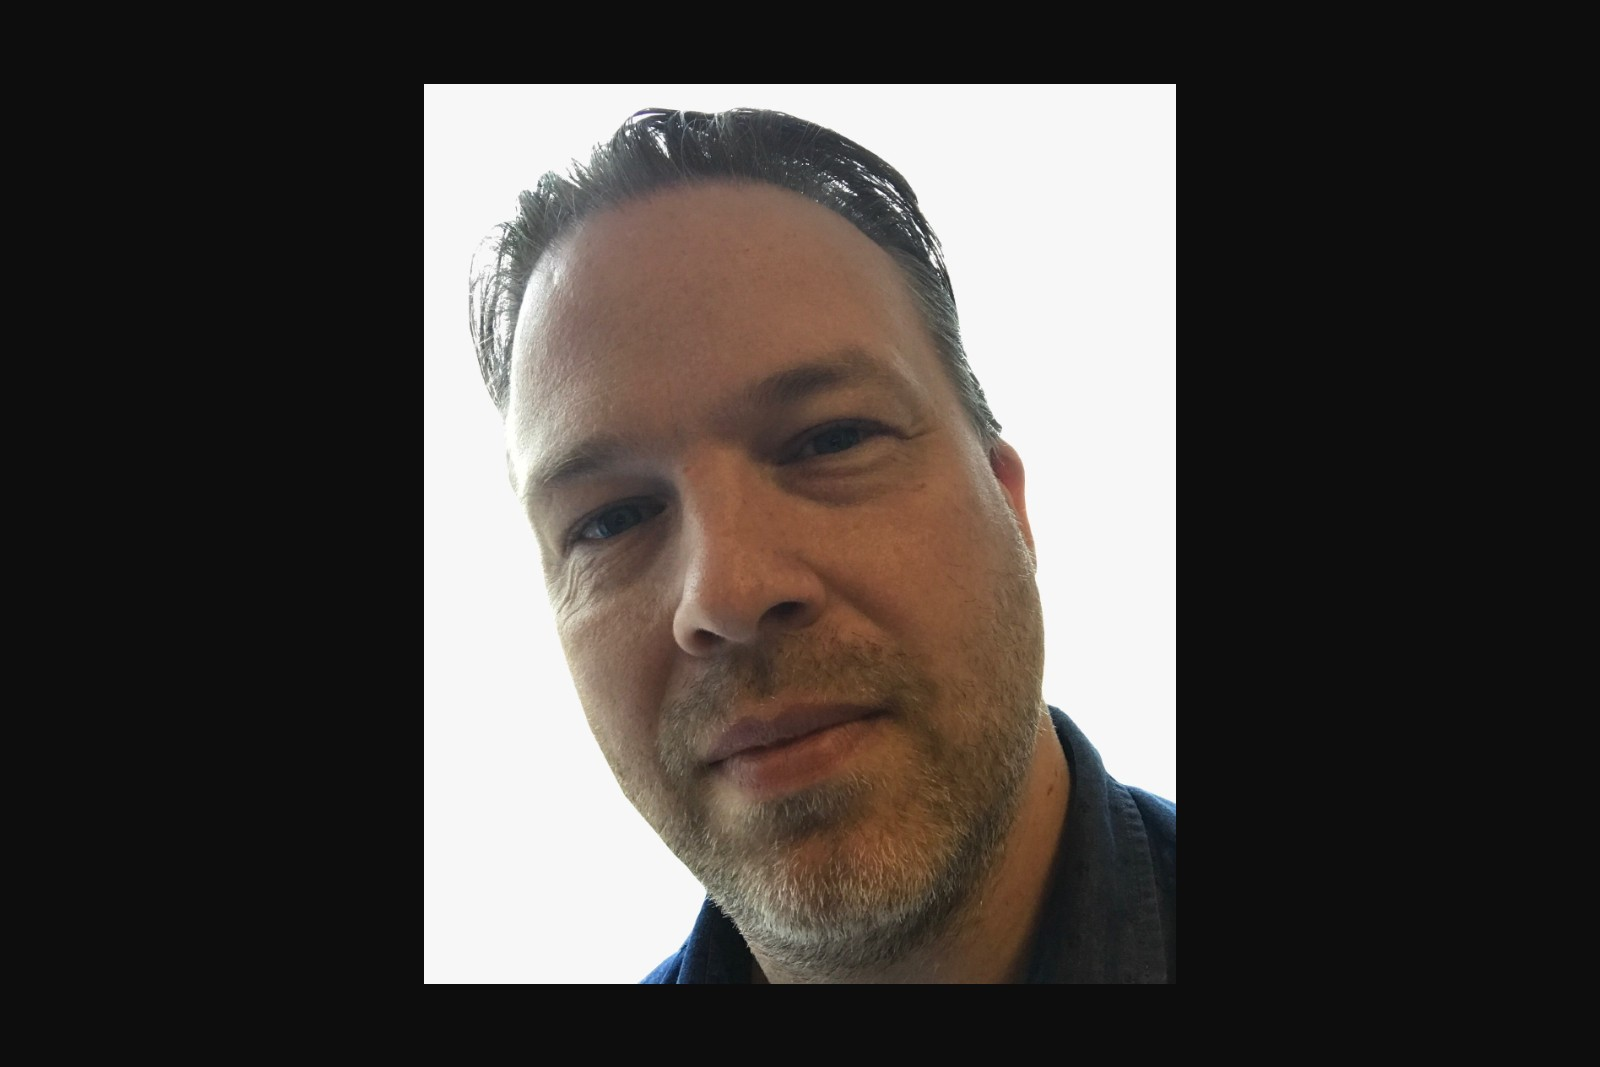 Steve Randall Constructive Voices podcast presenter